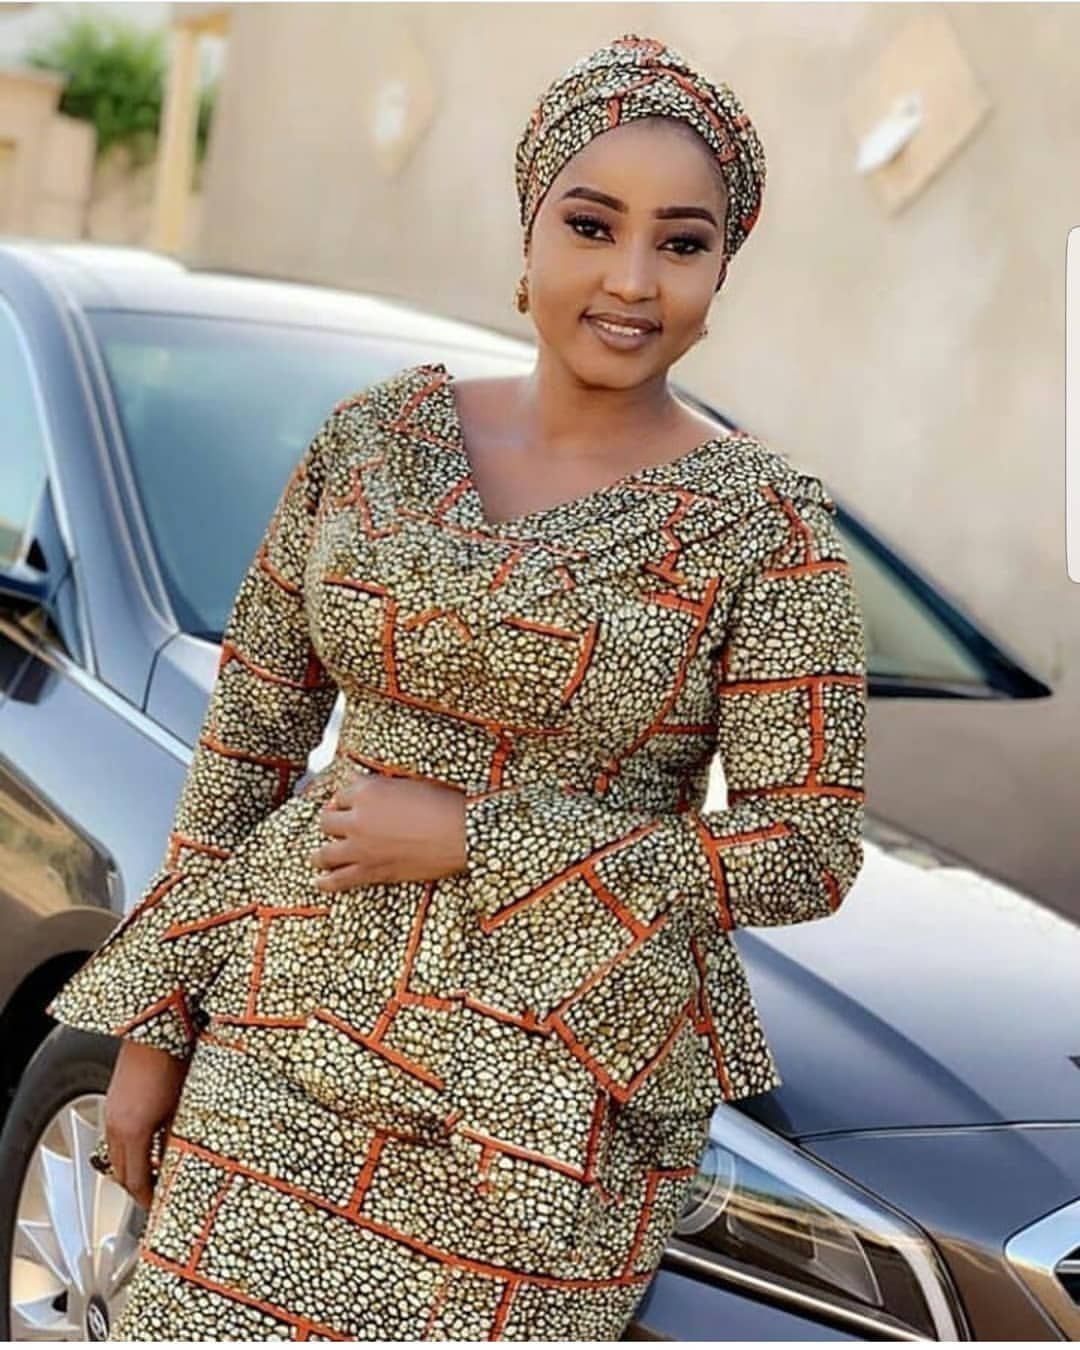 Modele de couture pagne africain - pi ti li